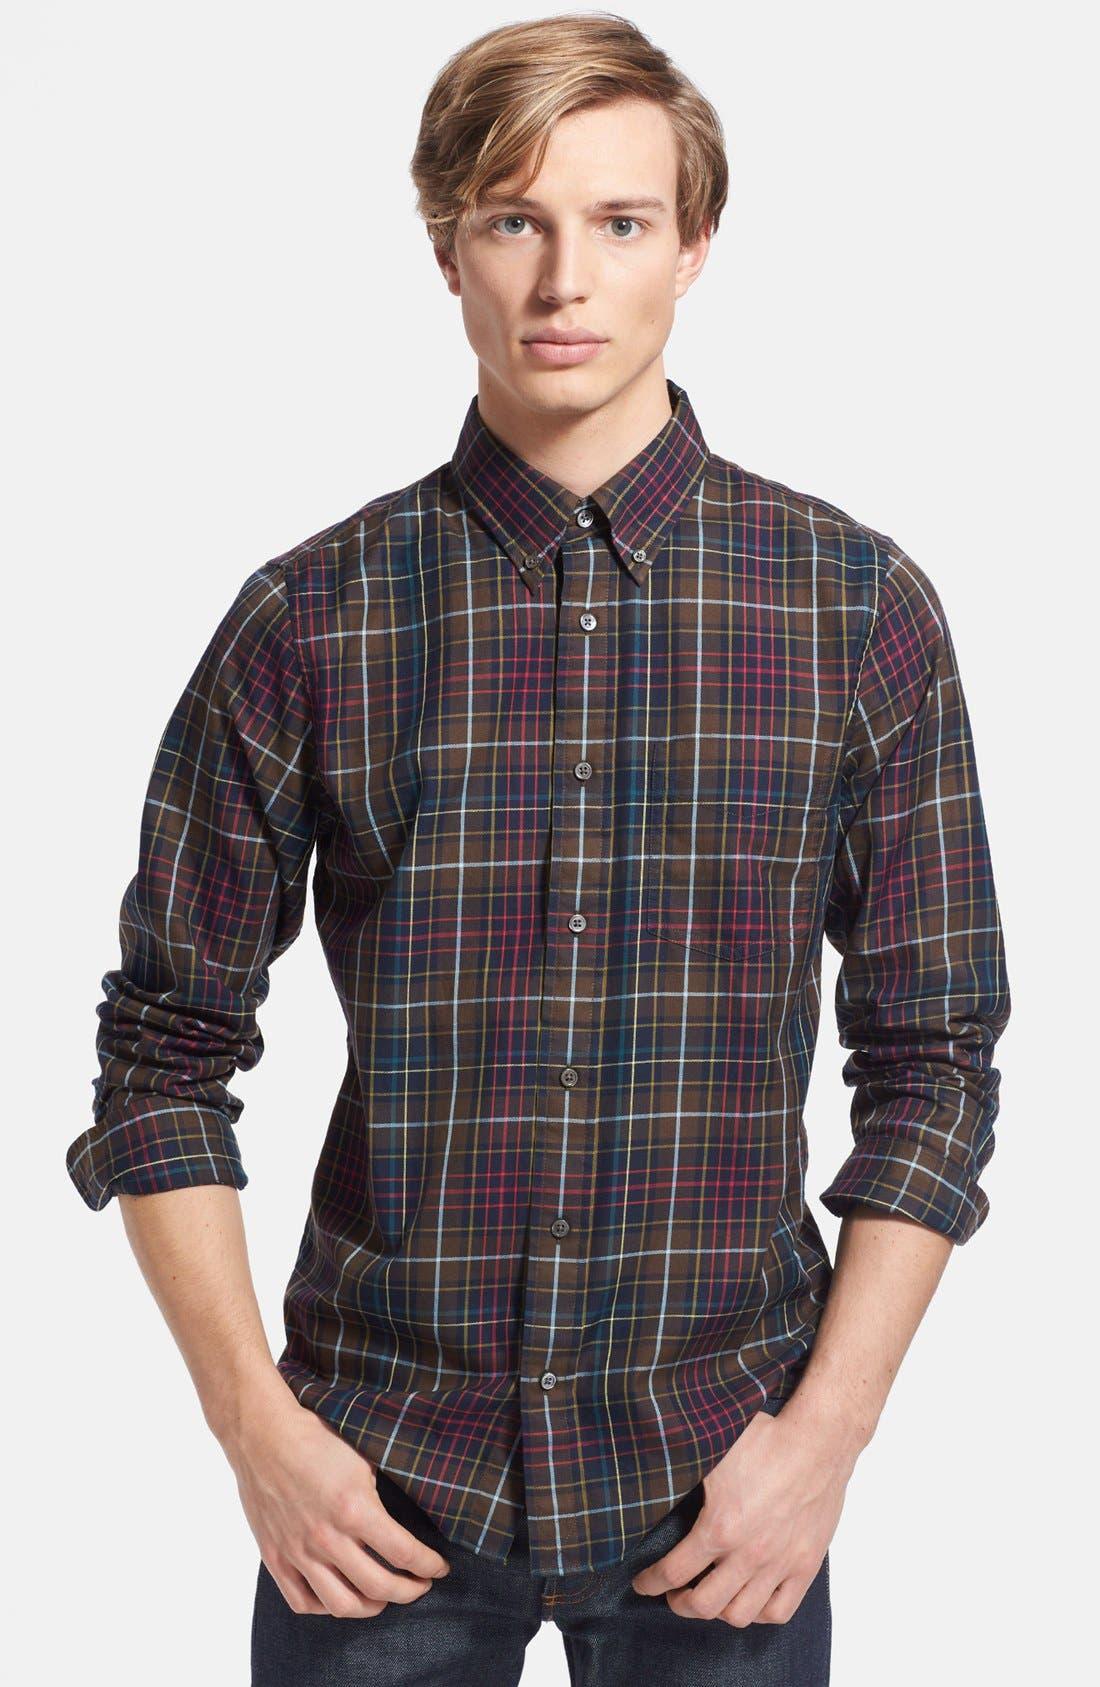 Alternate Image 1 Selected - Jack Spade 'Thetford' Plaid Shirt